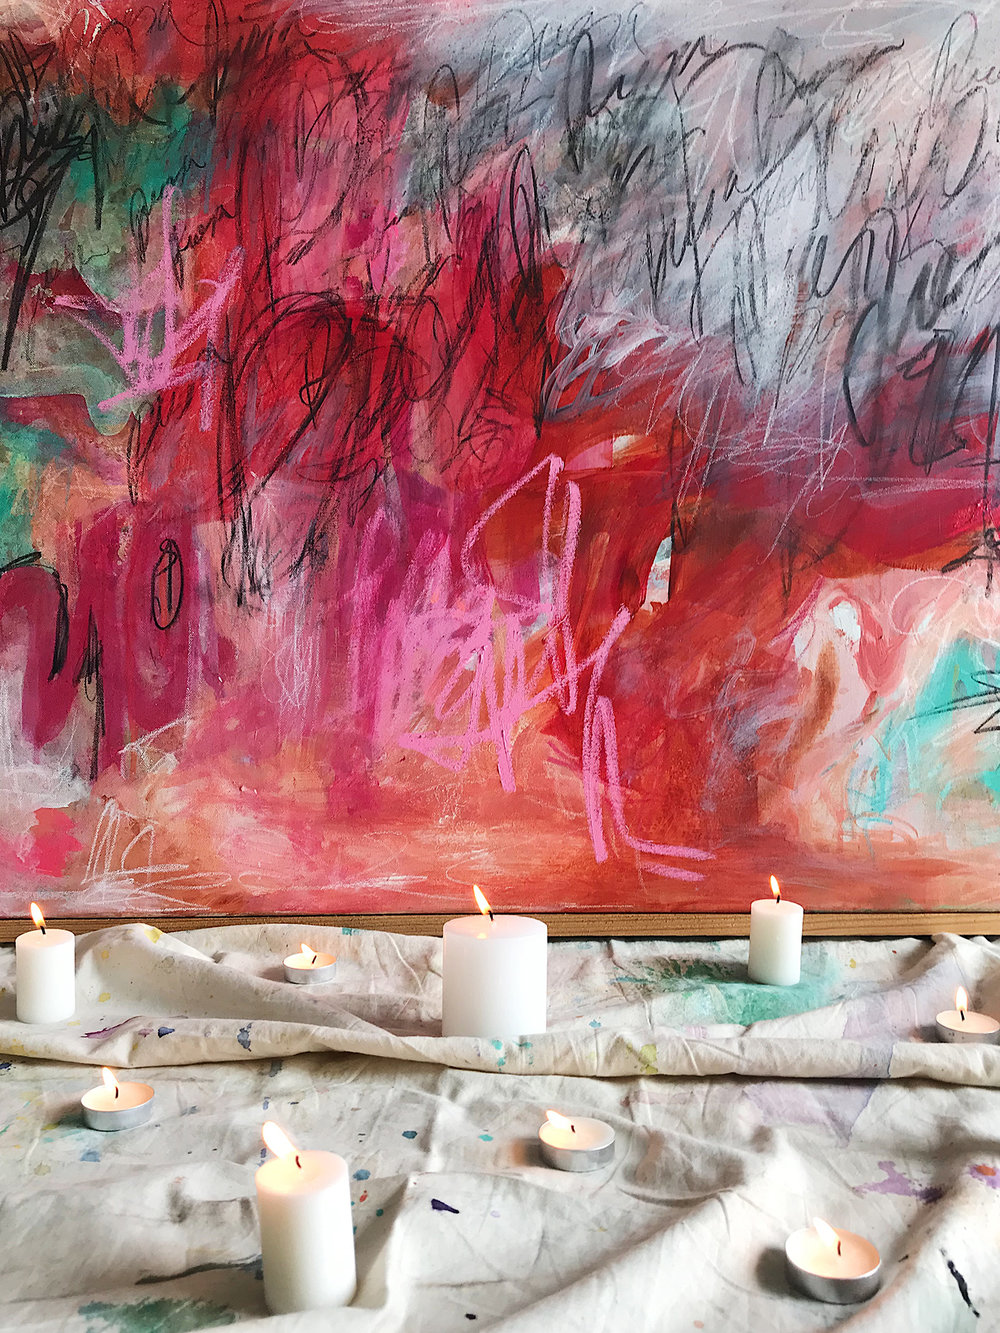 sheila-burgos-pink-moon-candles.jpg